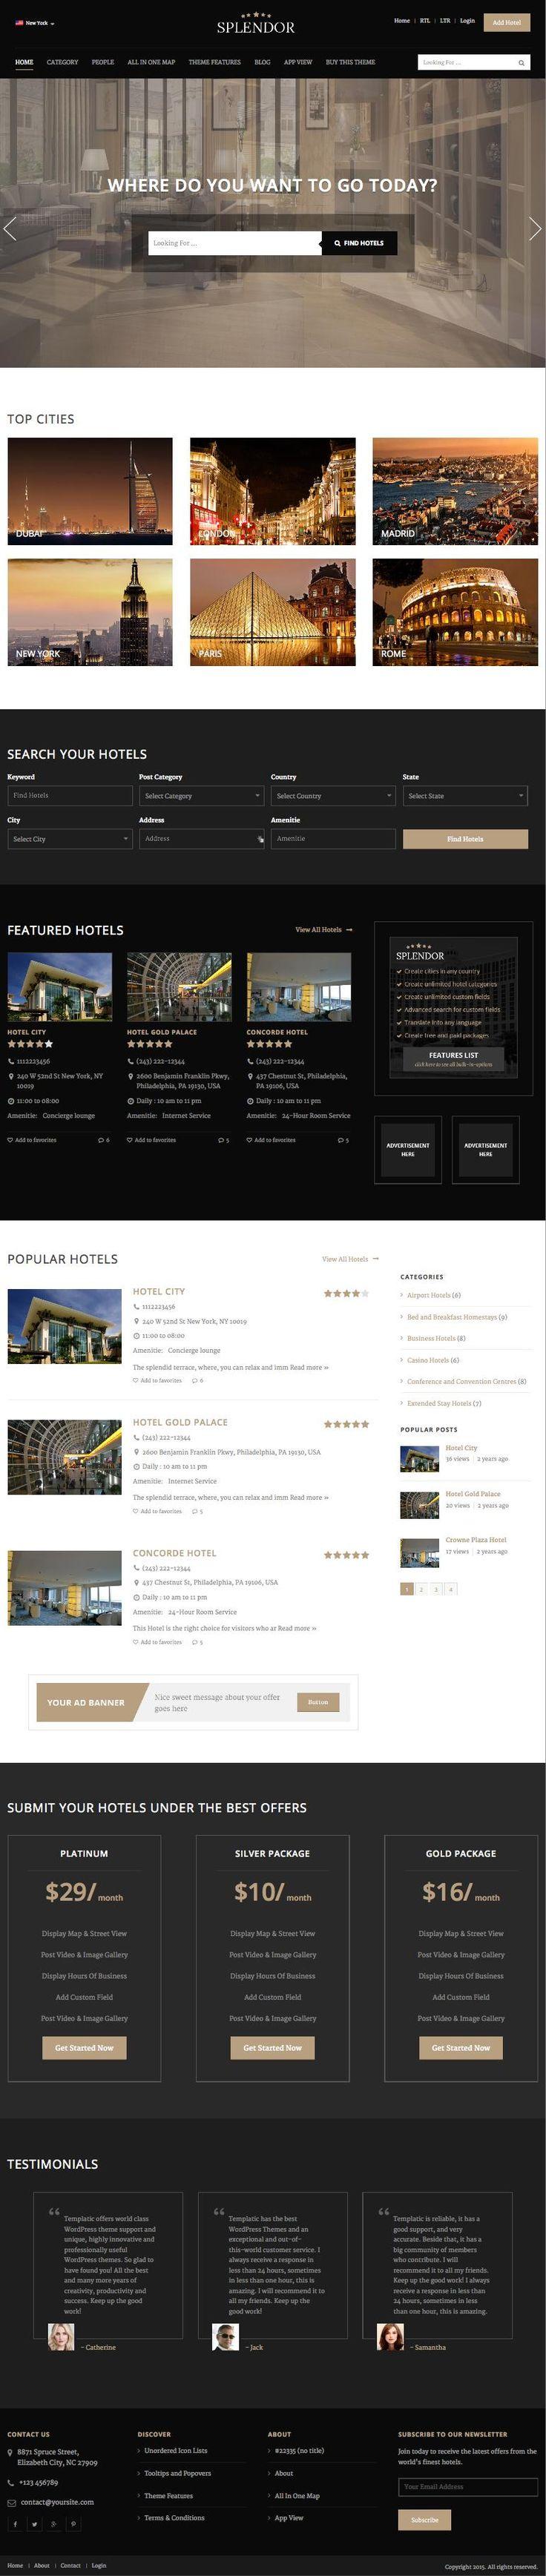 Splendor WordPress Theme for Hotel Directory Listings